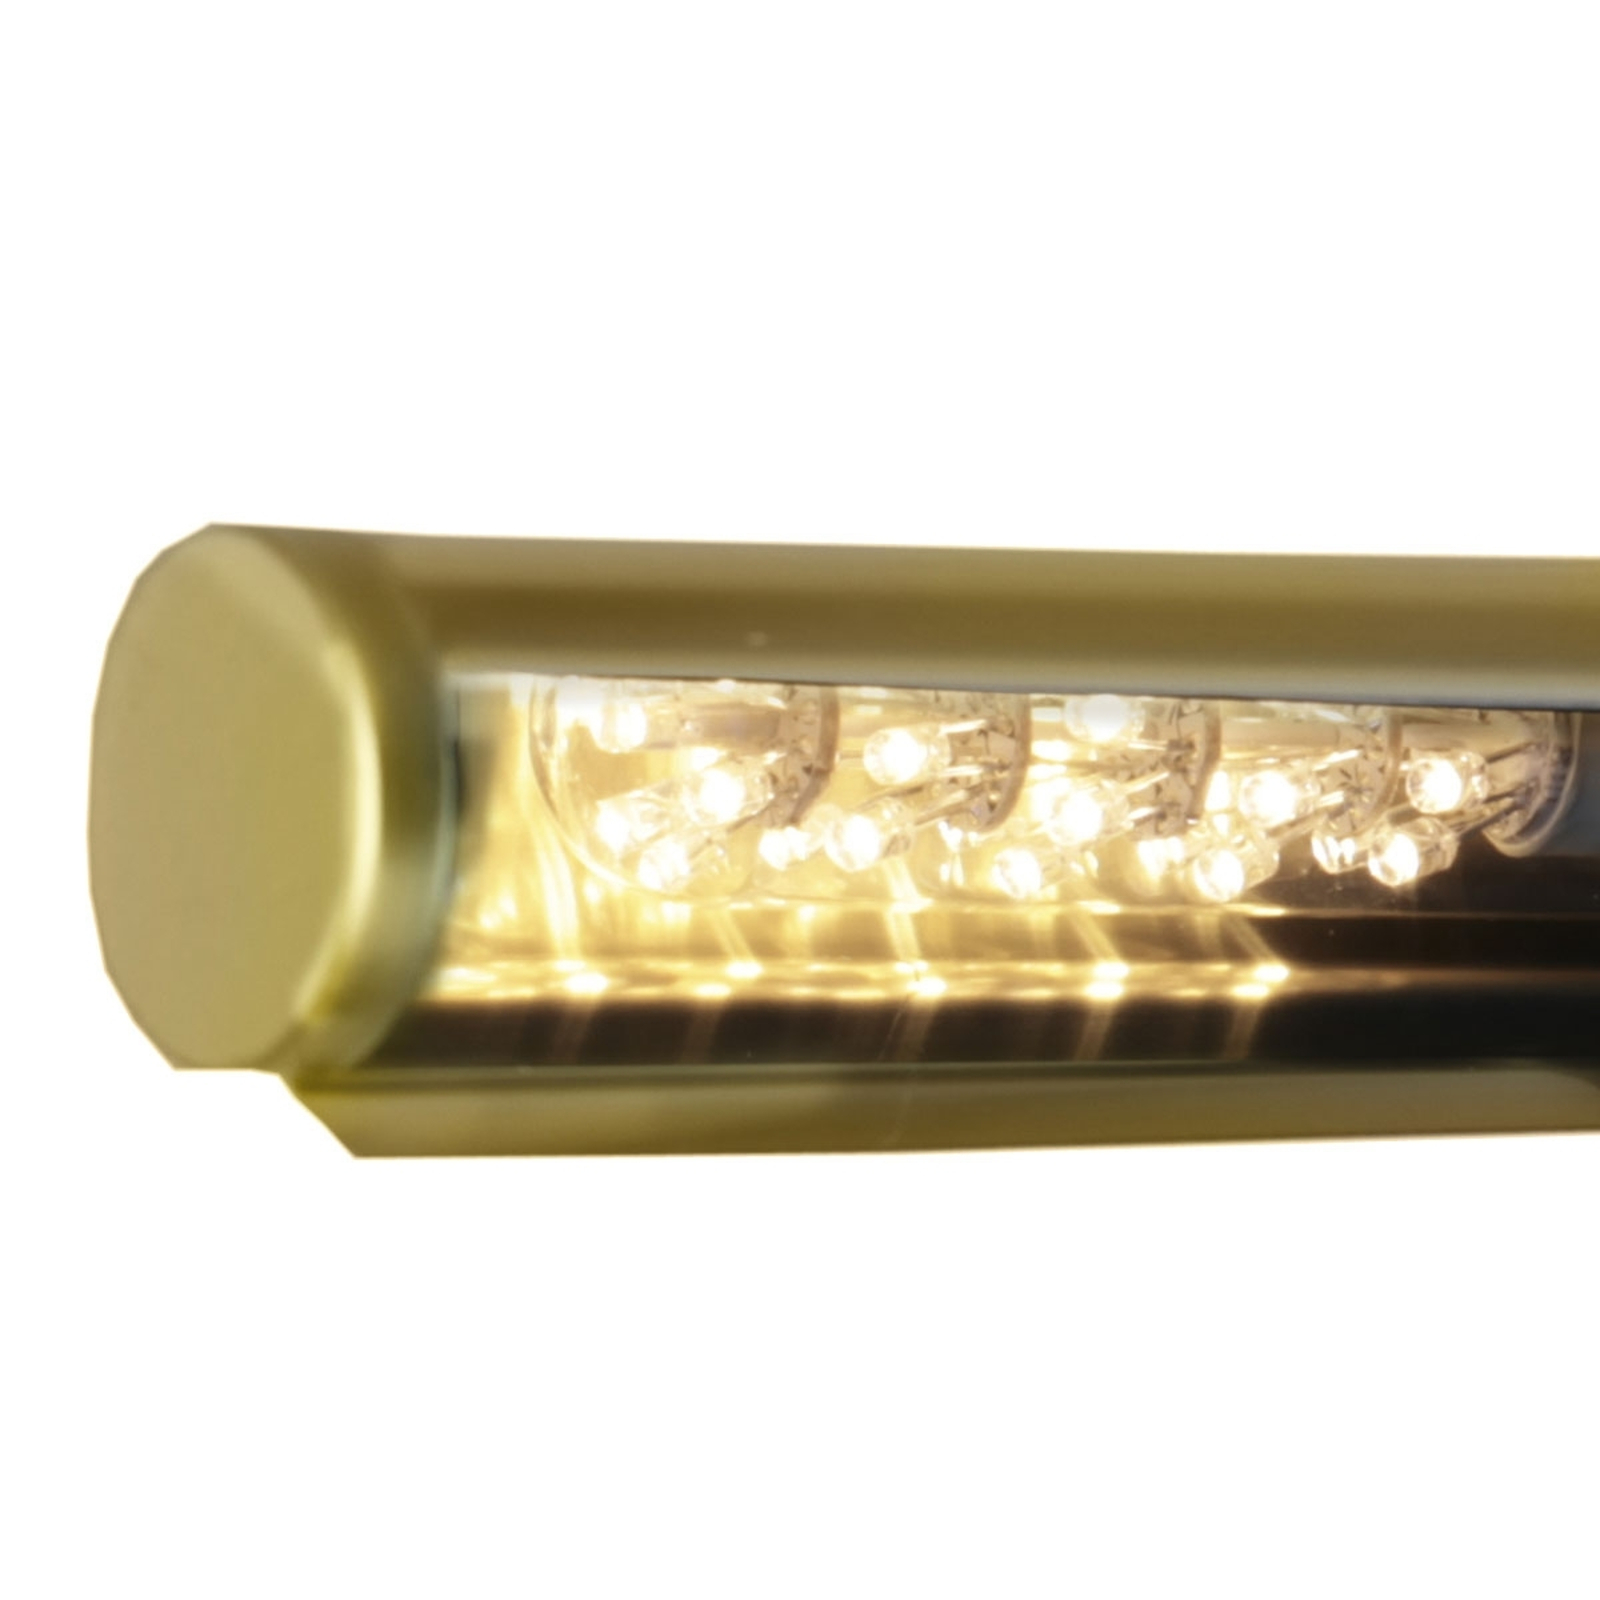 E14 1,5W LED-Röhrenlampe klar, warmweiß 2100 K